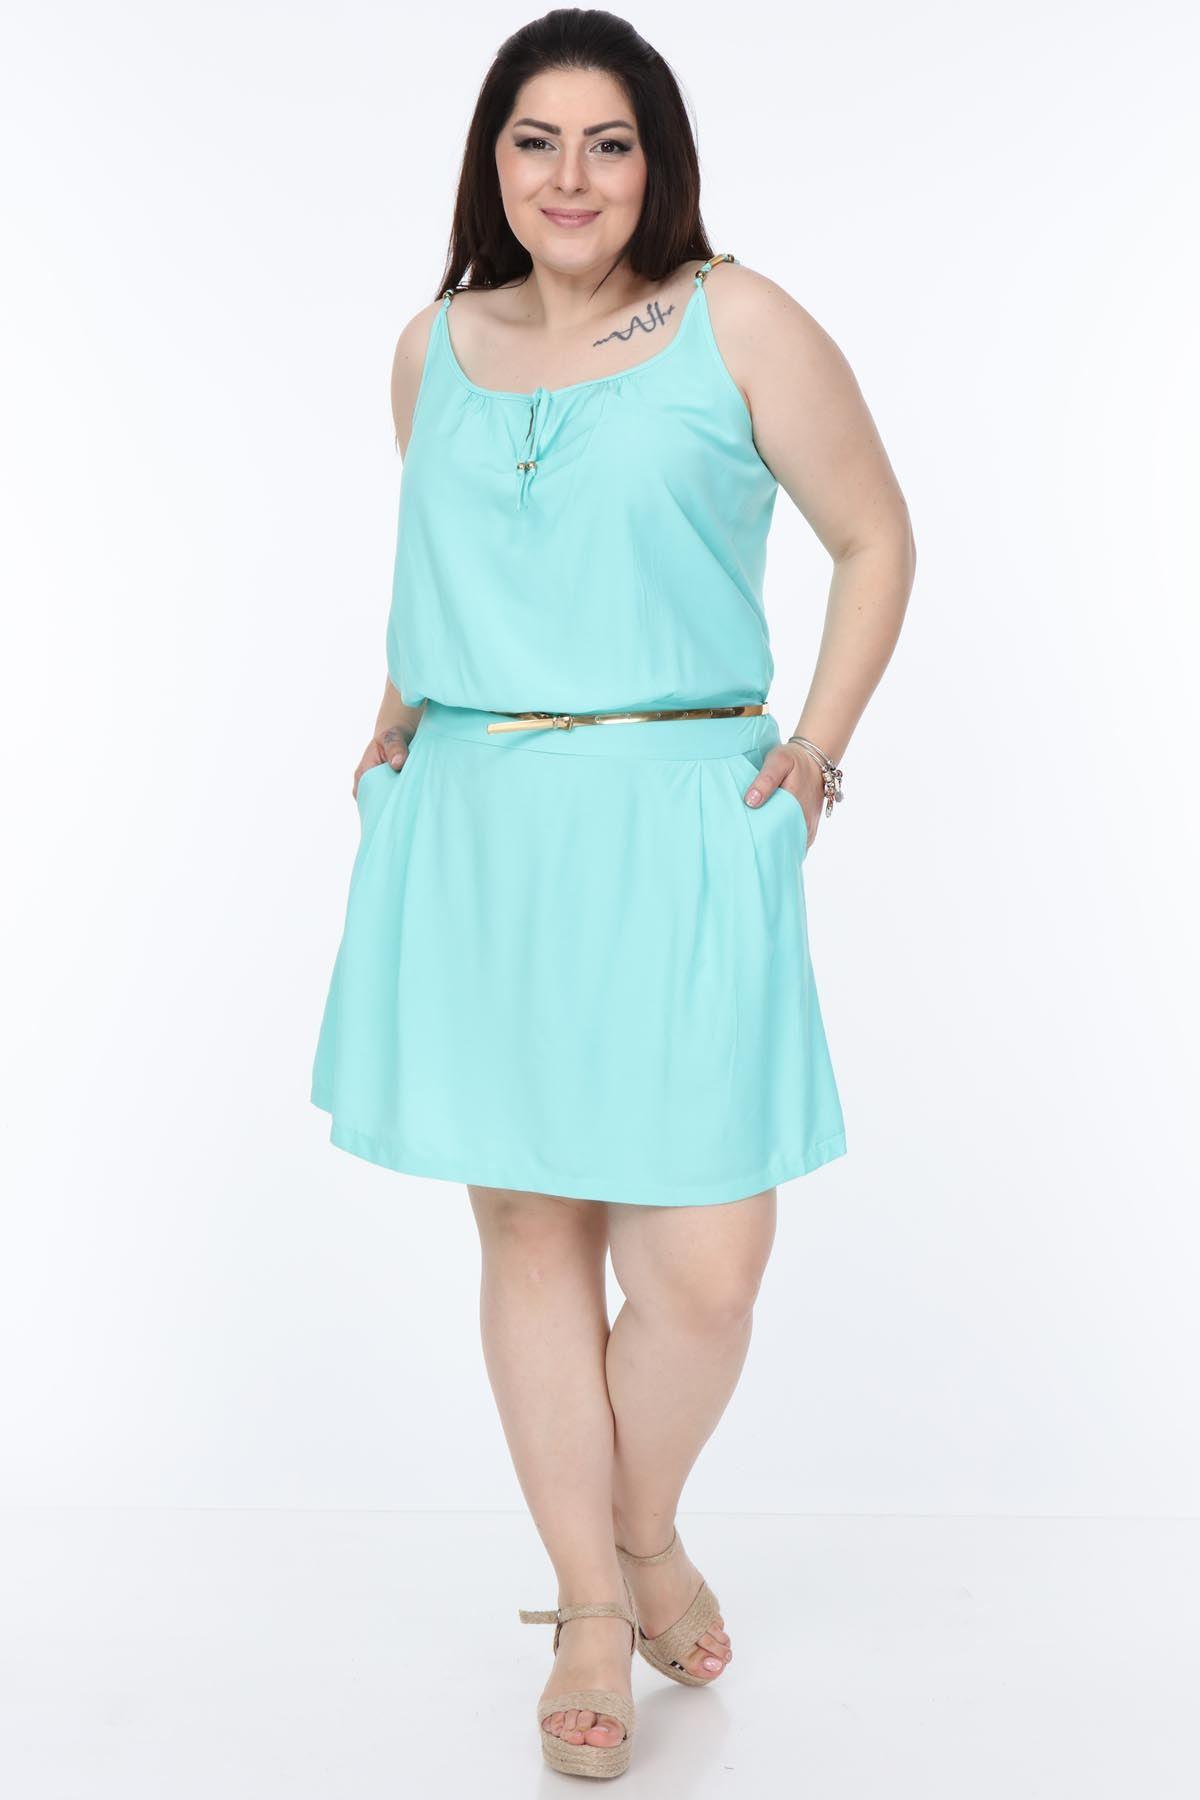 Mint Yazlık Büyük Beden Elbise 1A-1061